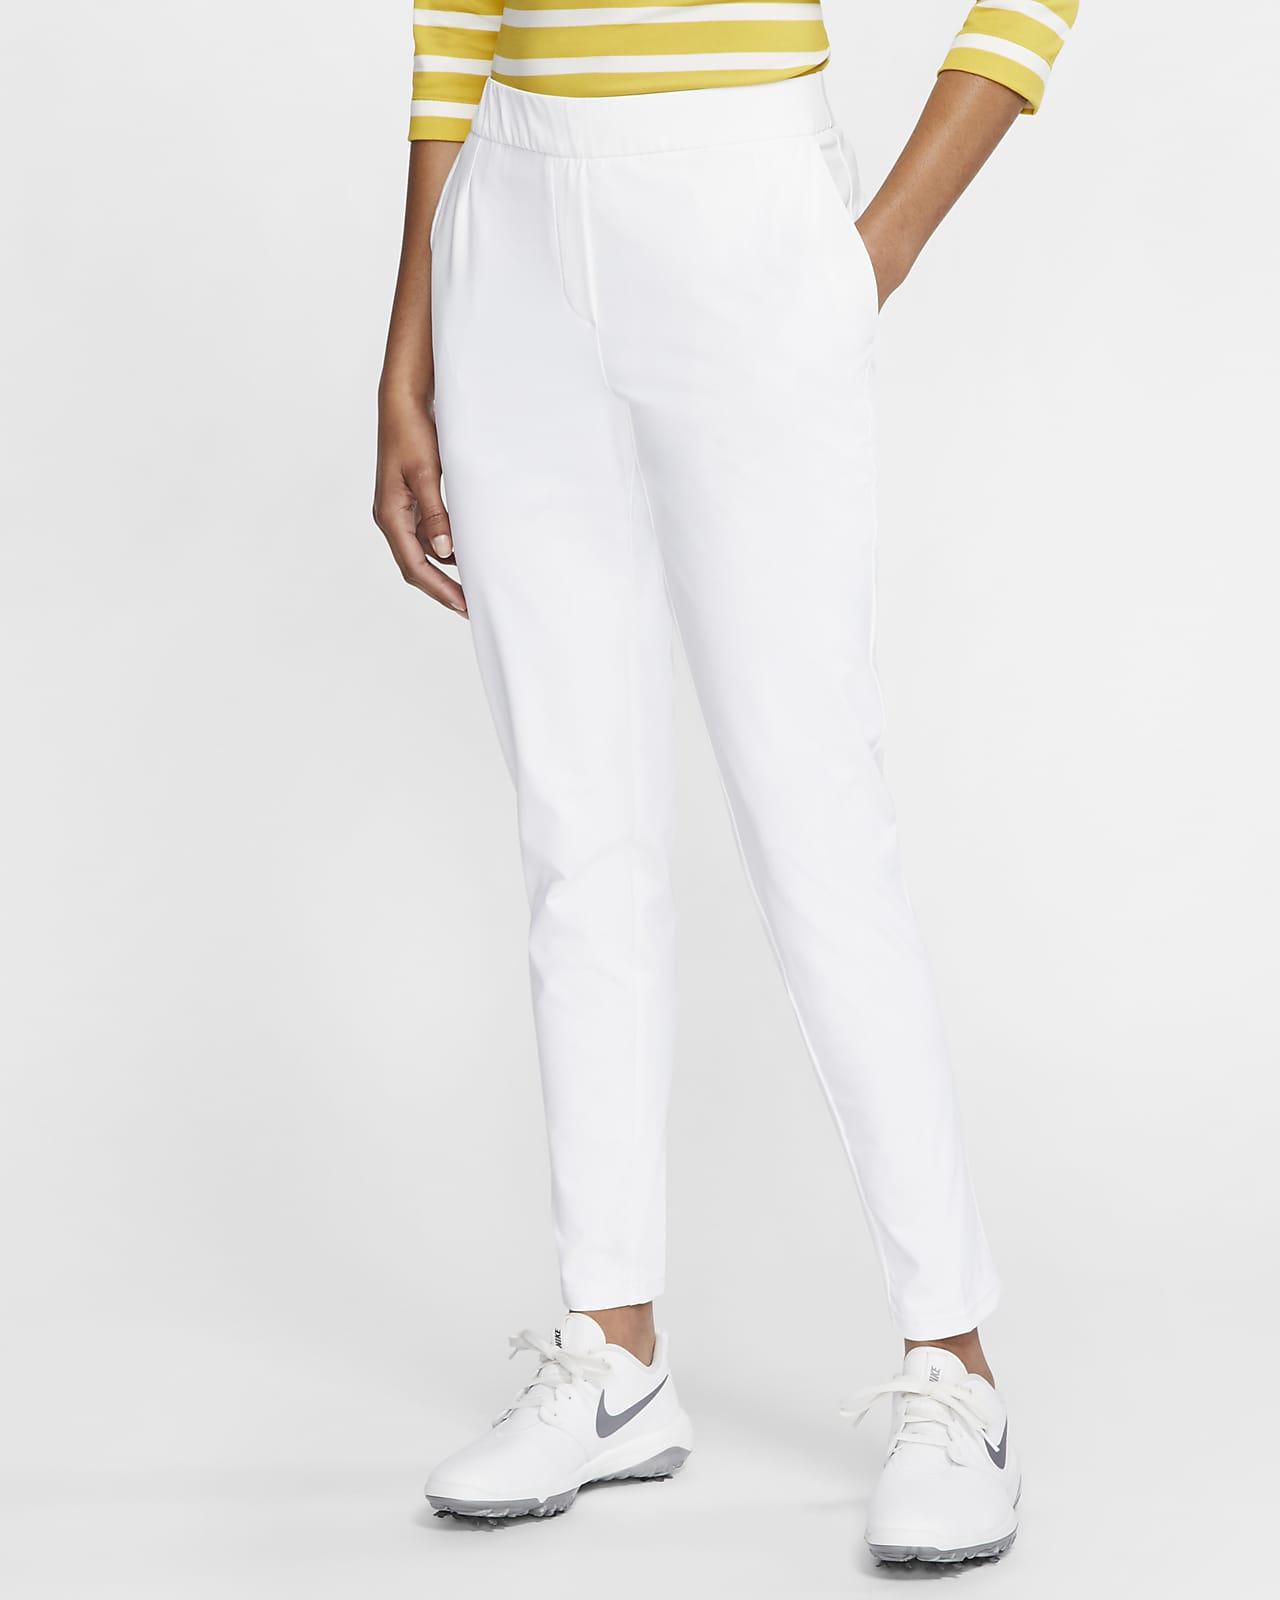 Pantalones de golf para mujer Nike Flex UV Victory